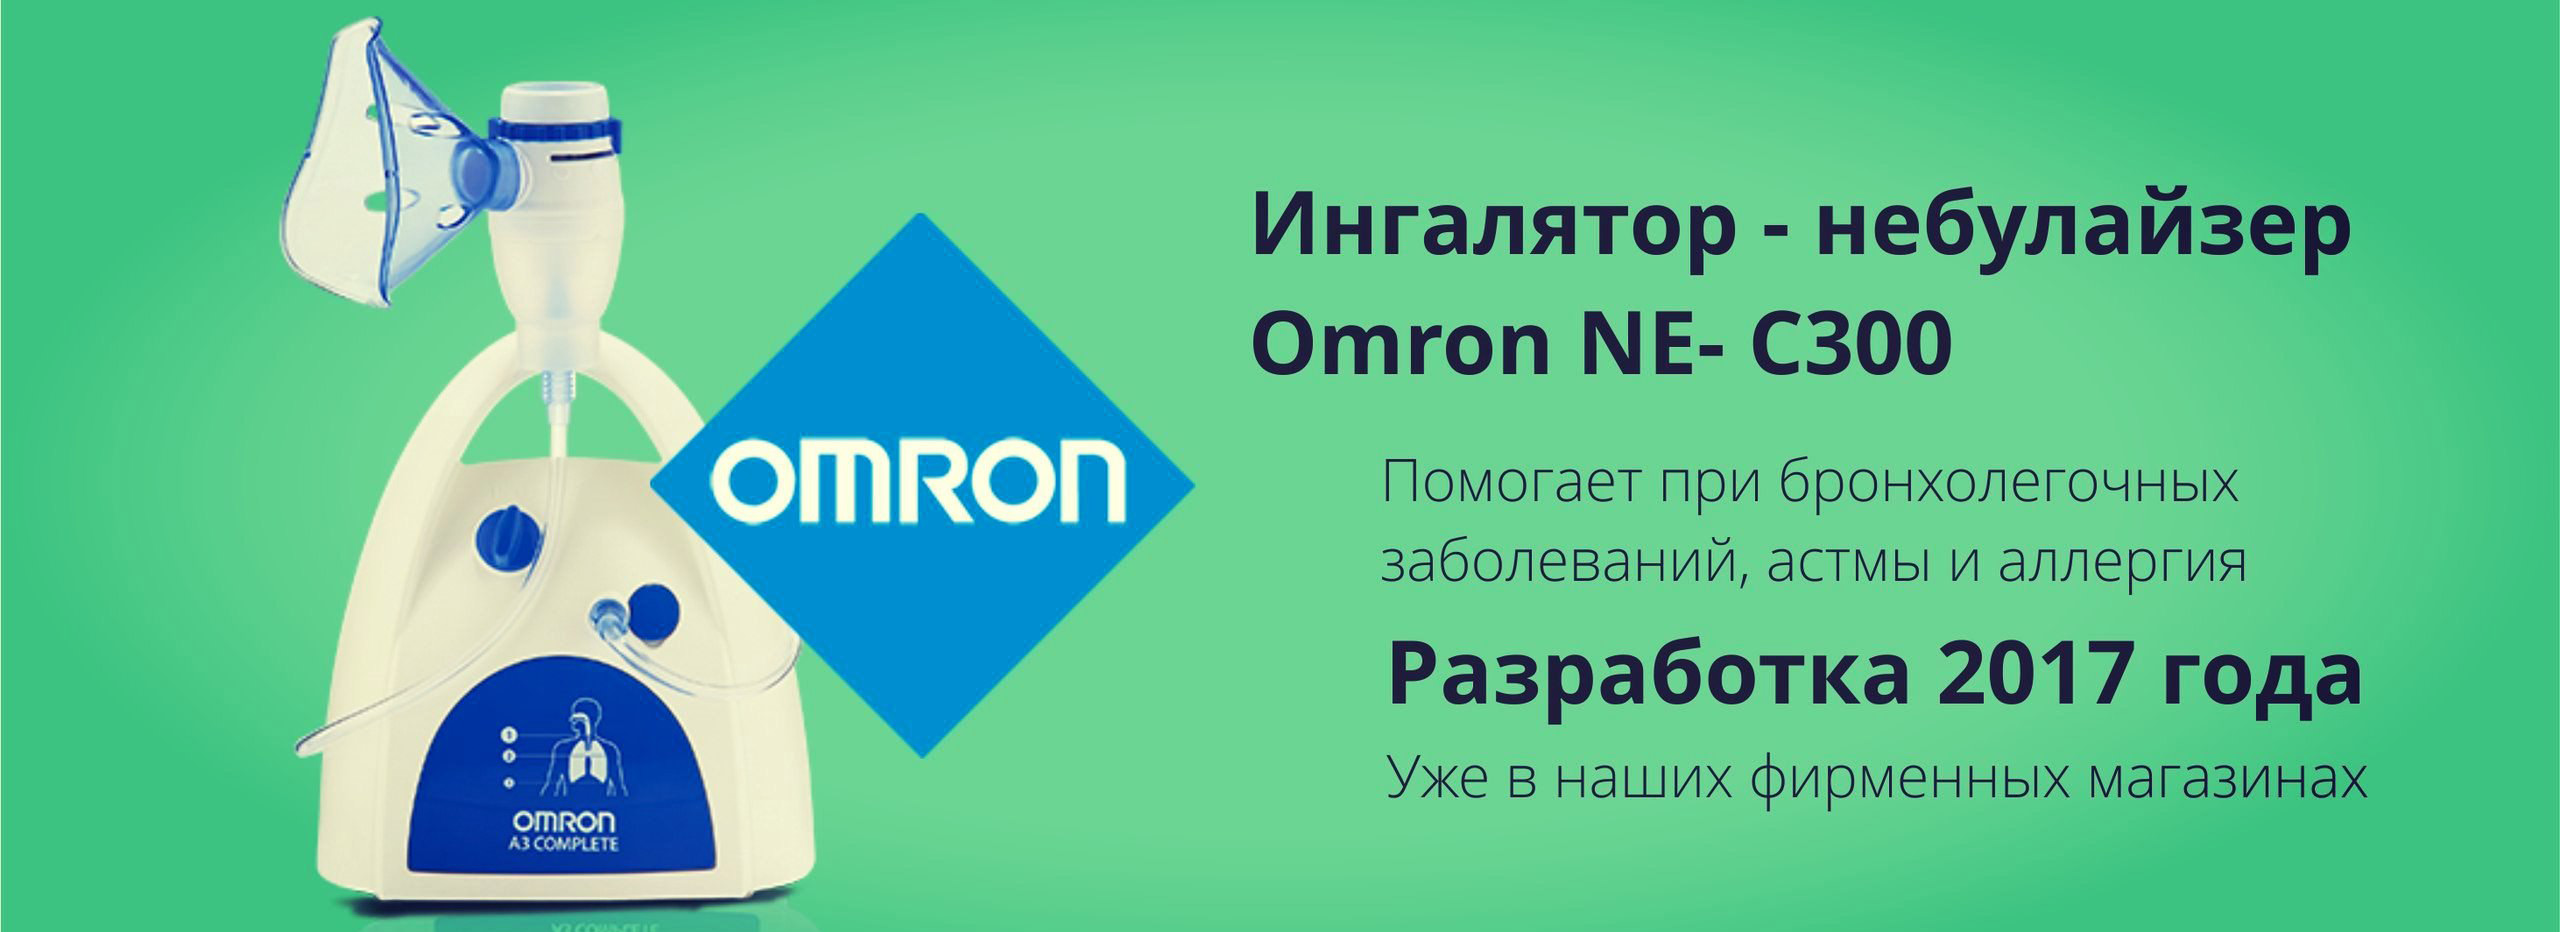 omron300ne-new